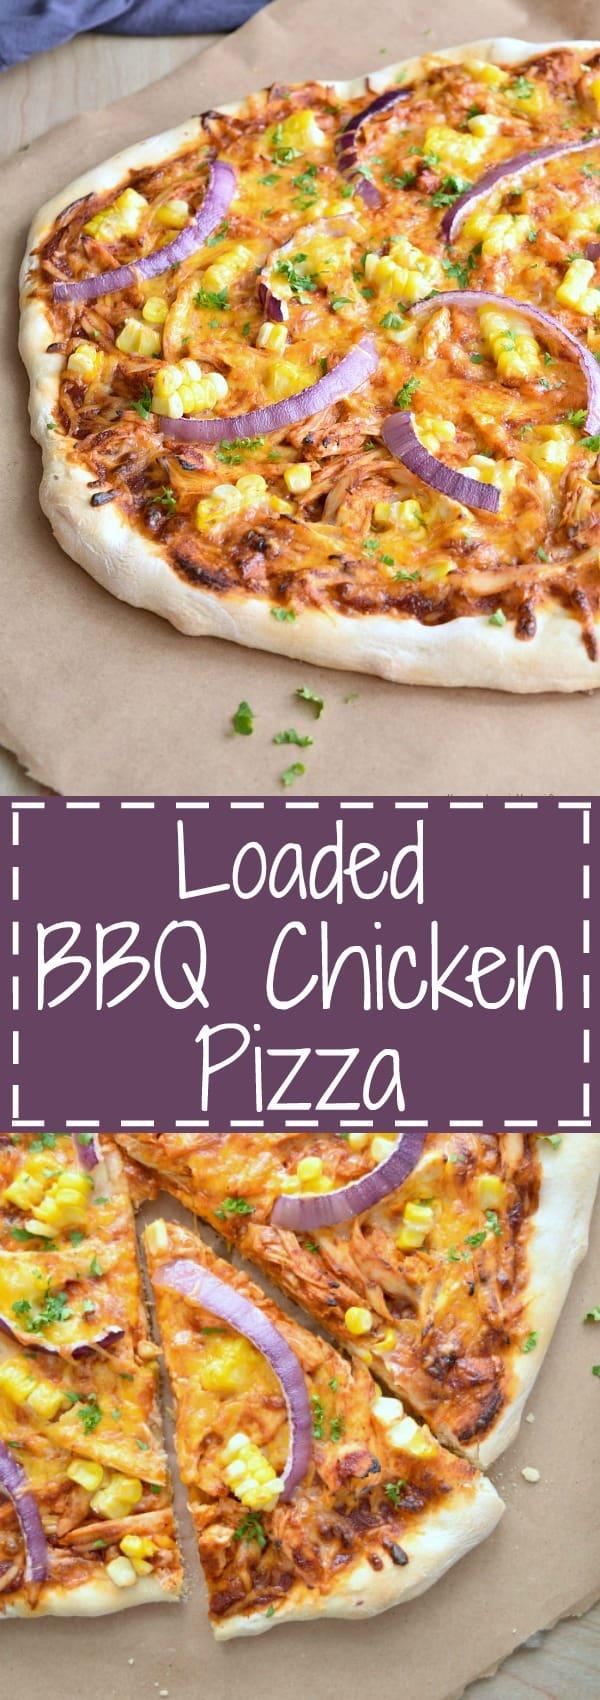 Loaded BBQ Chicken Pizza